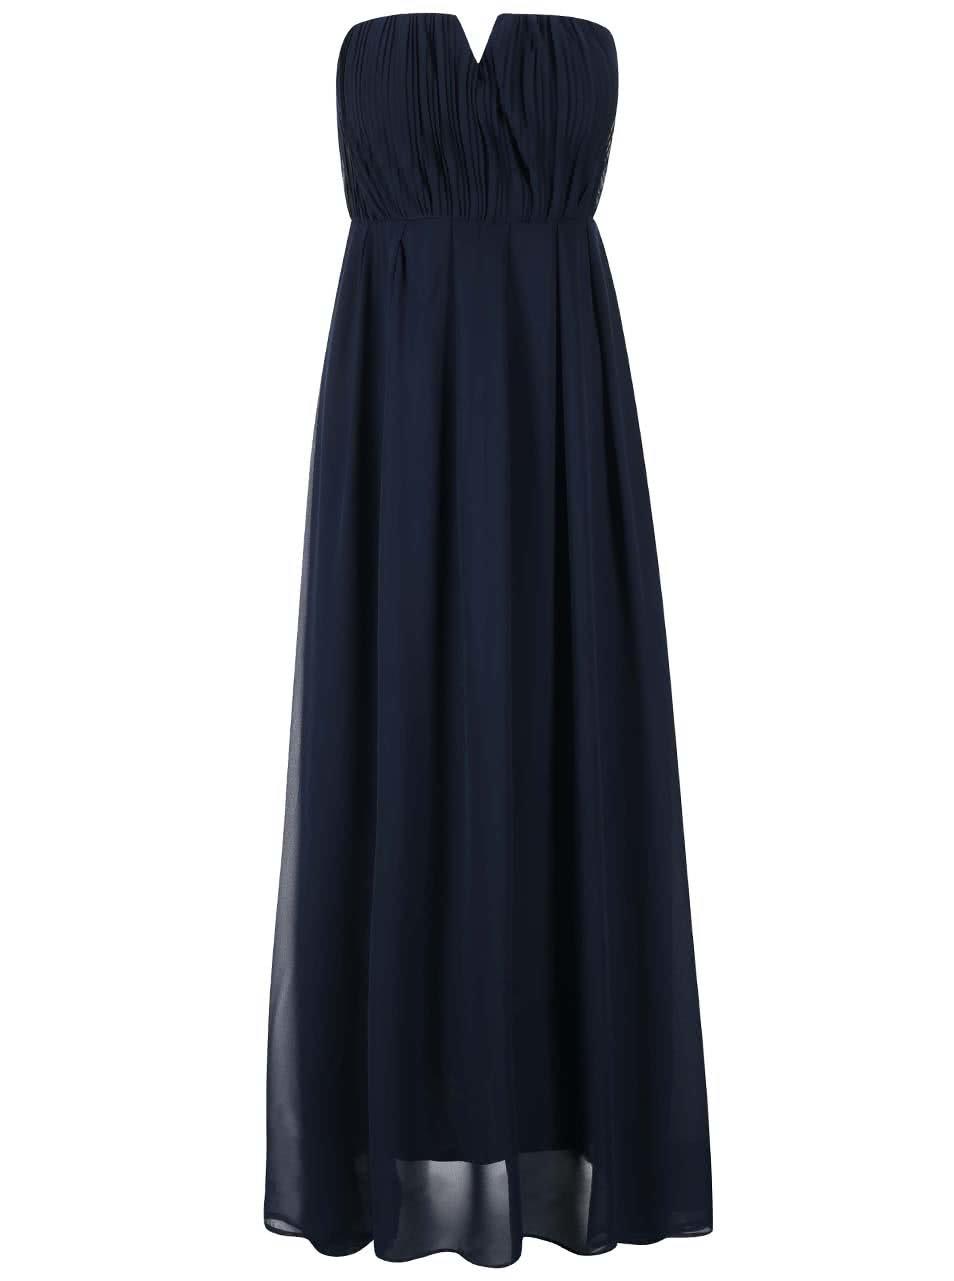 b42f25219bc0 Tmavomodré šifónové šaty AX Paris ...